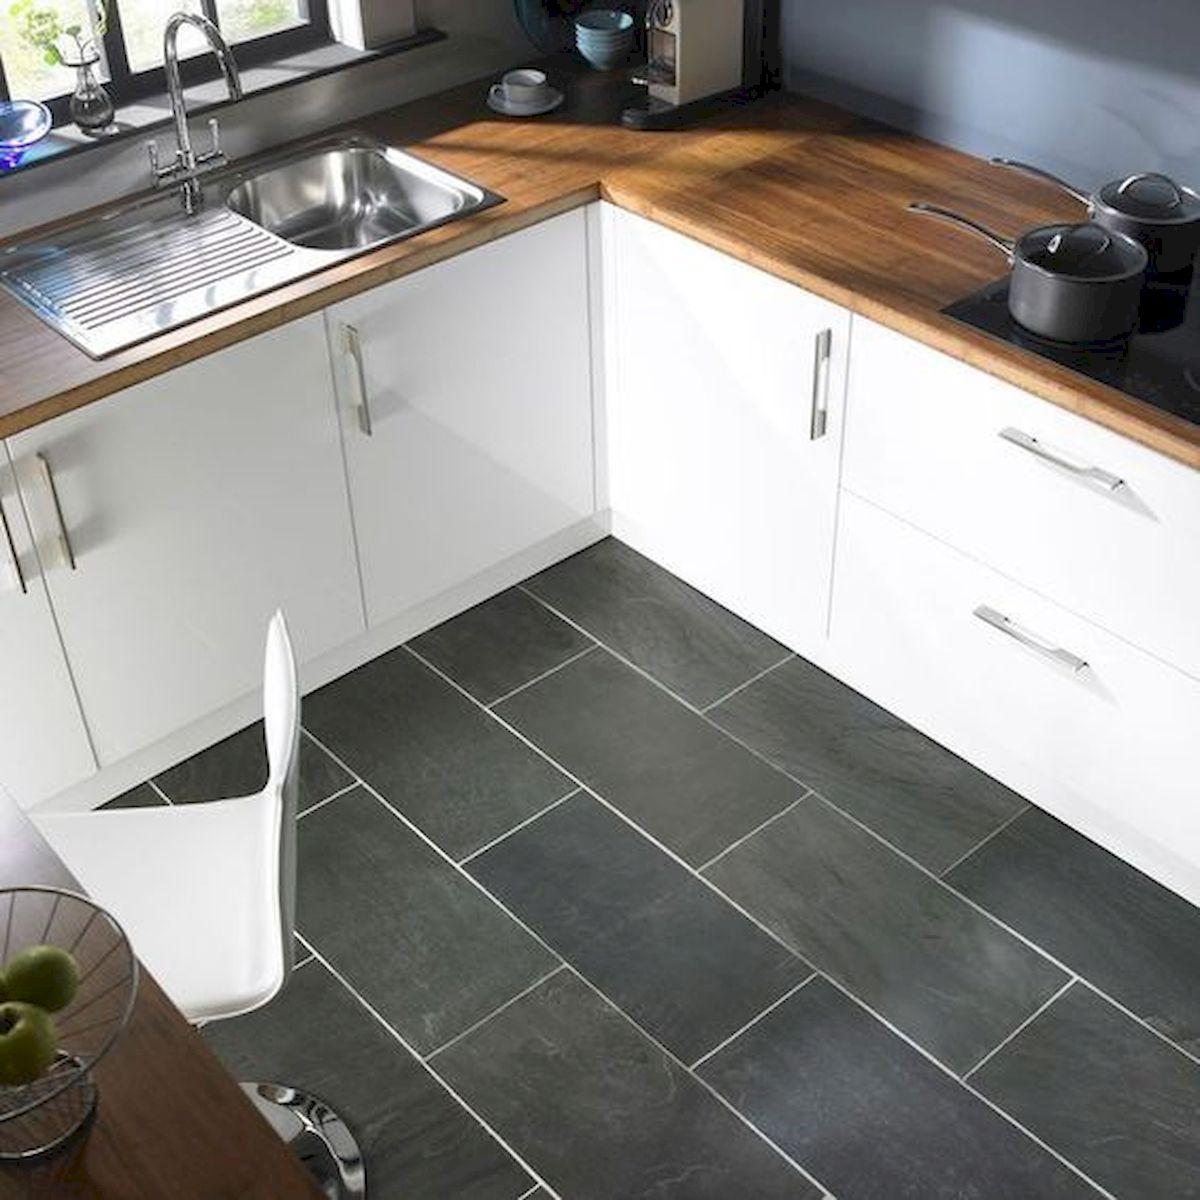 Kreatecube On Twitter Pick Out The Perfect Tile Flooring Designs Ideas For Modern Kitchen Https T Co Gpen5dbbyp Tileflooring Flooringideas Flooringdesign Flooringcontractor Wkrlri1kcj